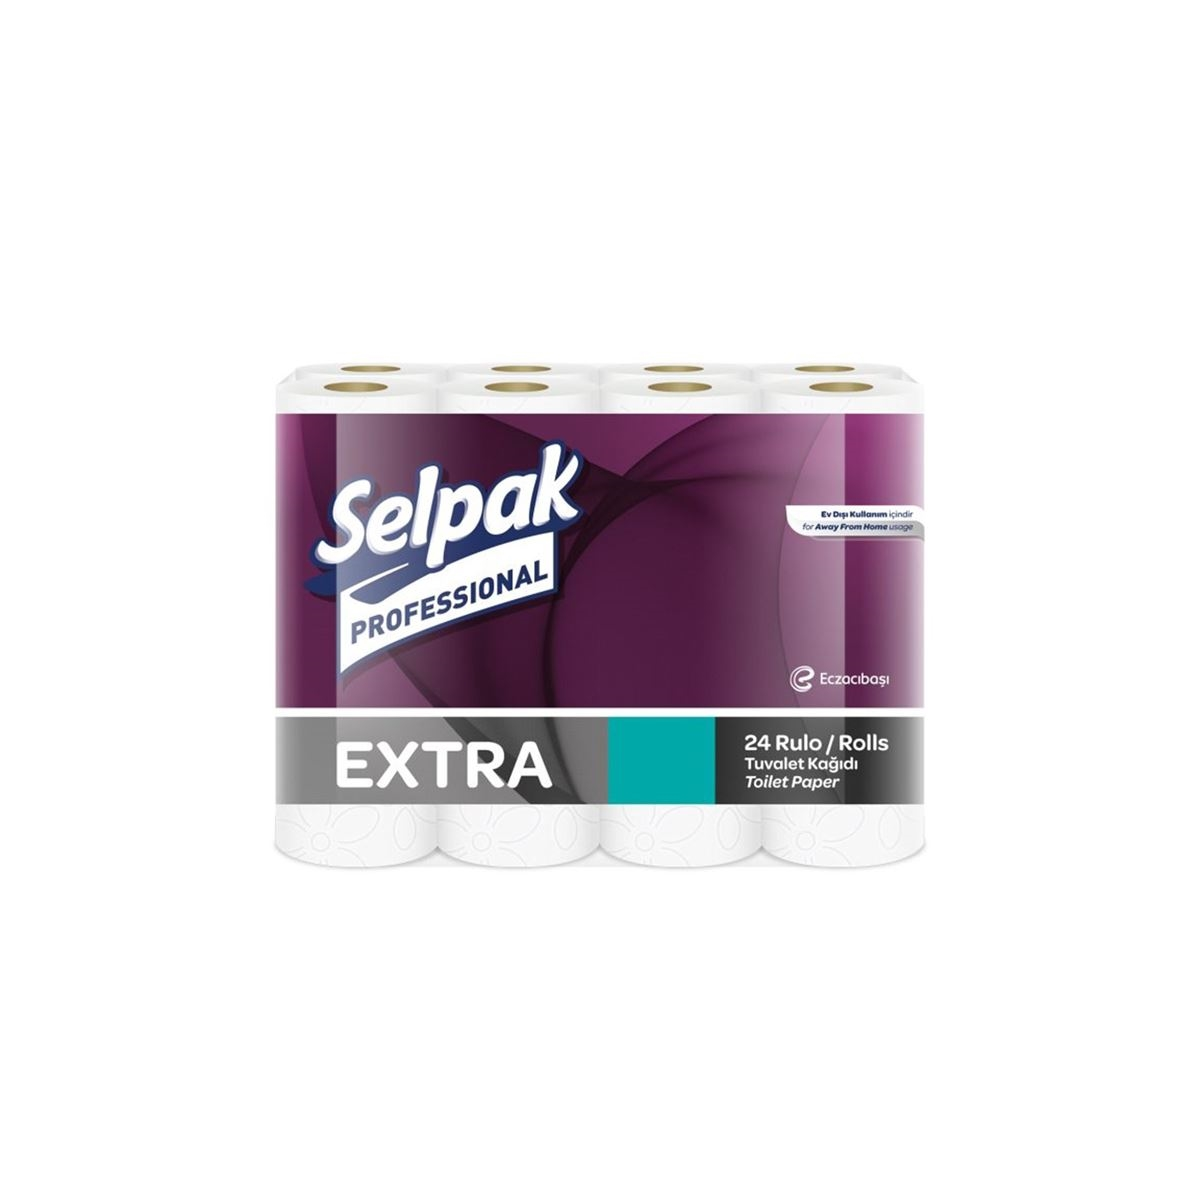 Selpak Professional Extra Tuvalet Kağıdı 24'lü 2 Katlı 3'lü Koli resmi